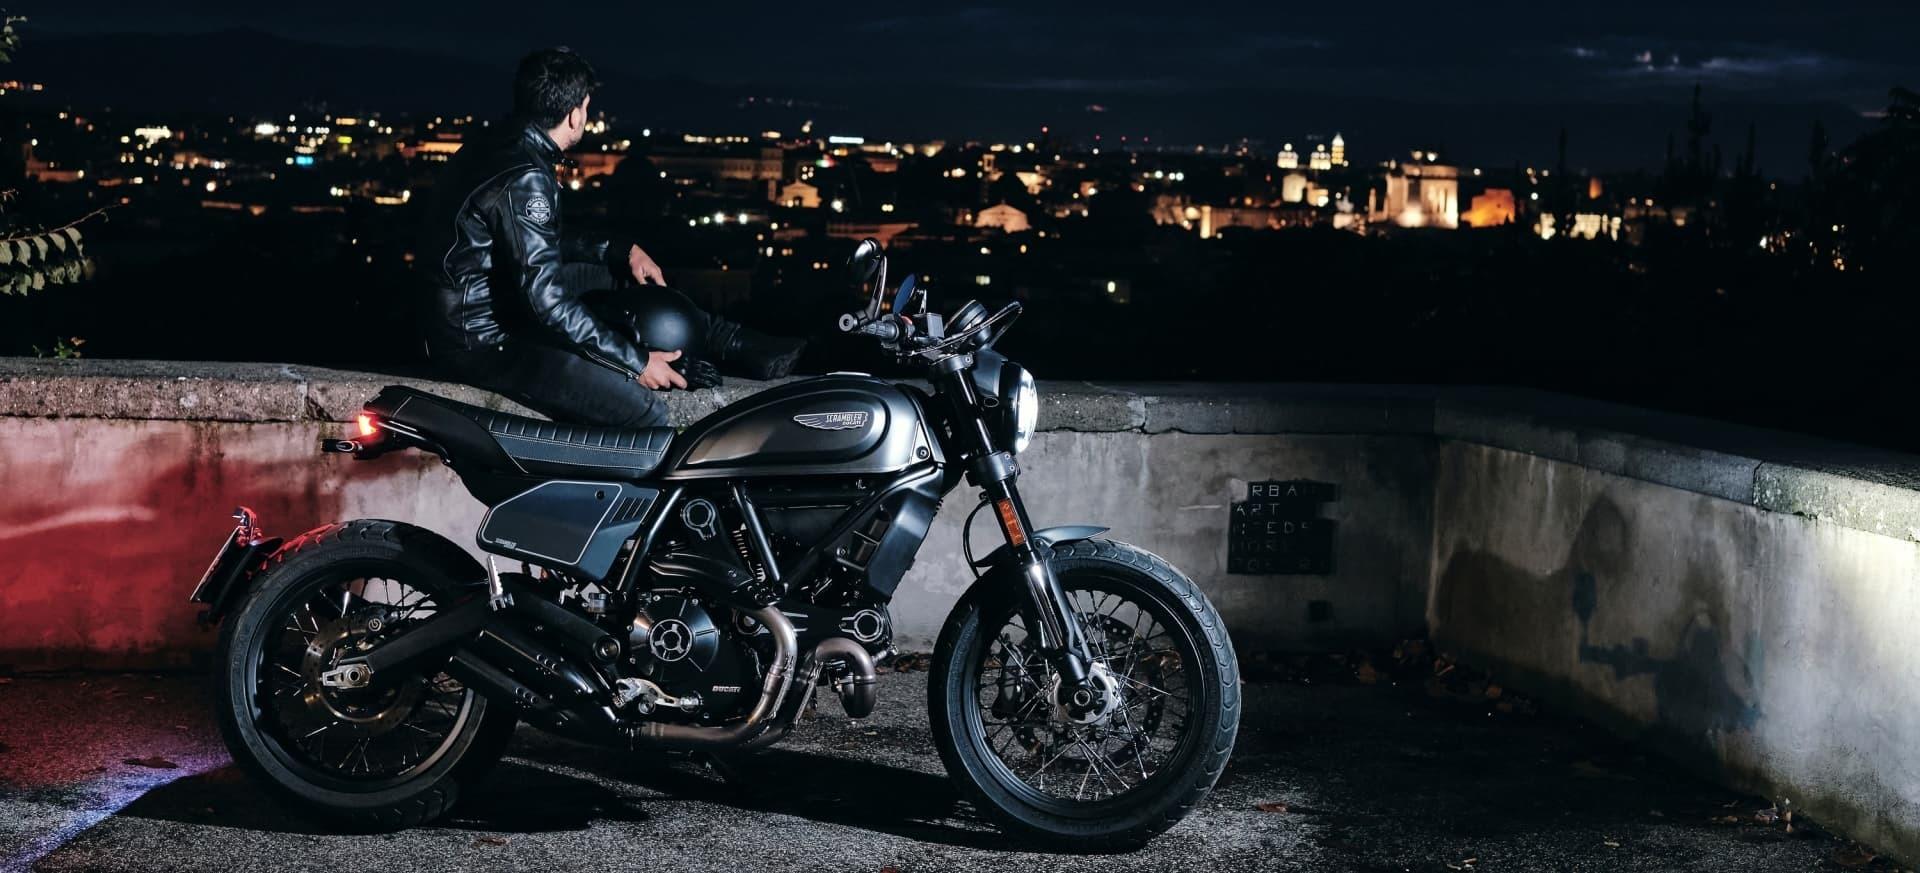 Dgt Puntos Ducati Scrambler Motos